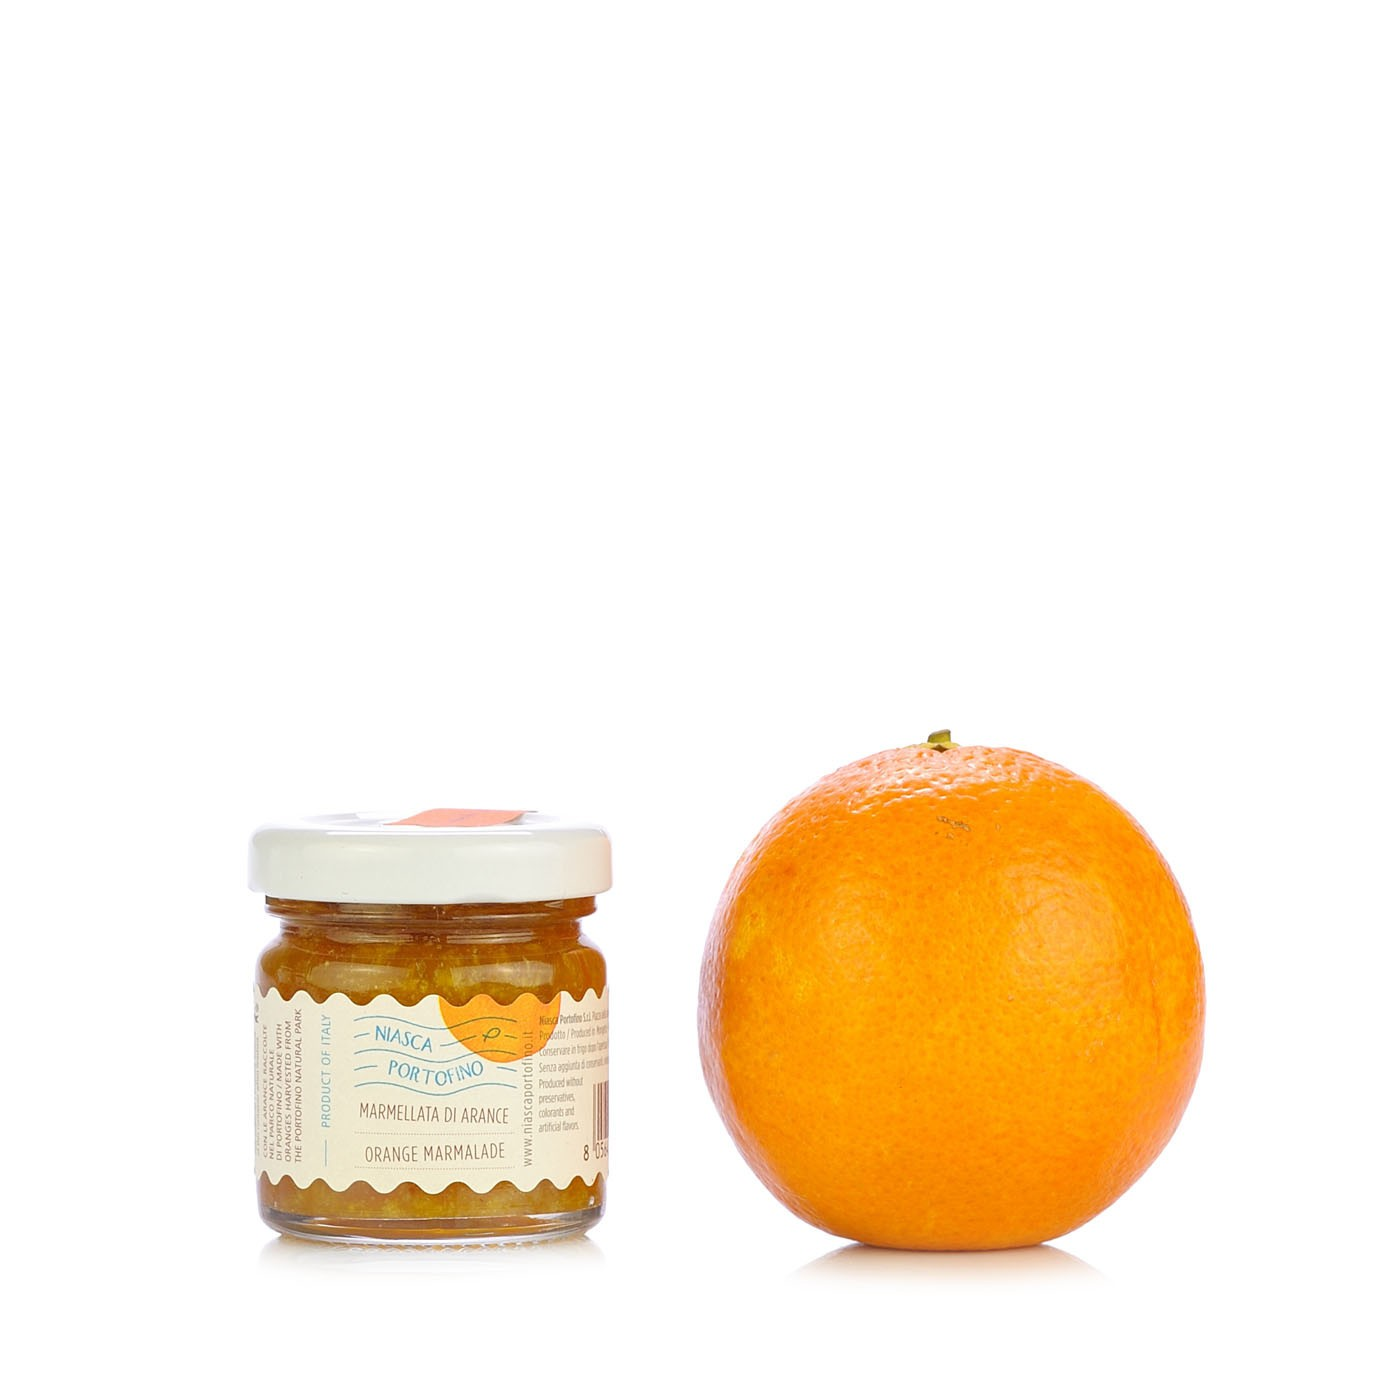 Orange Marmalade 1.41 oz